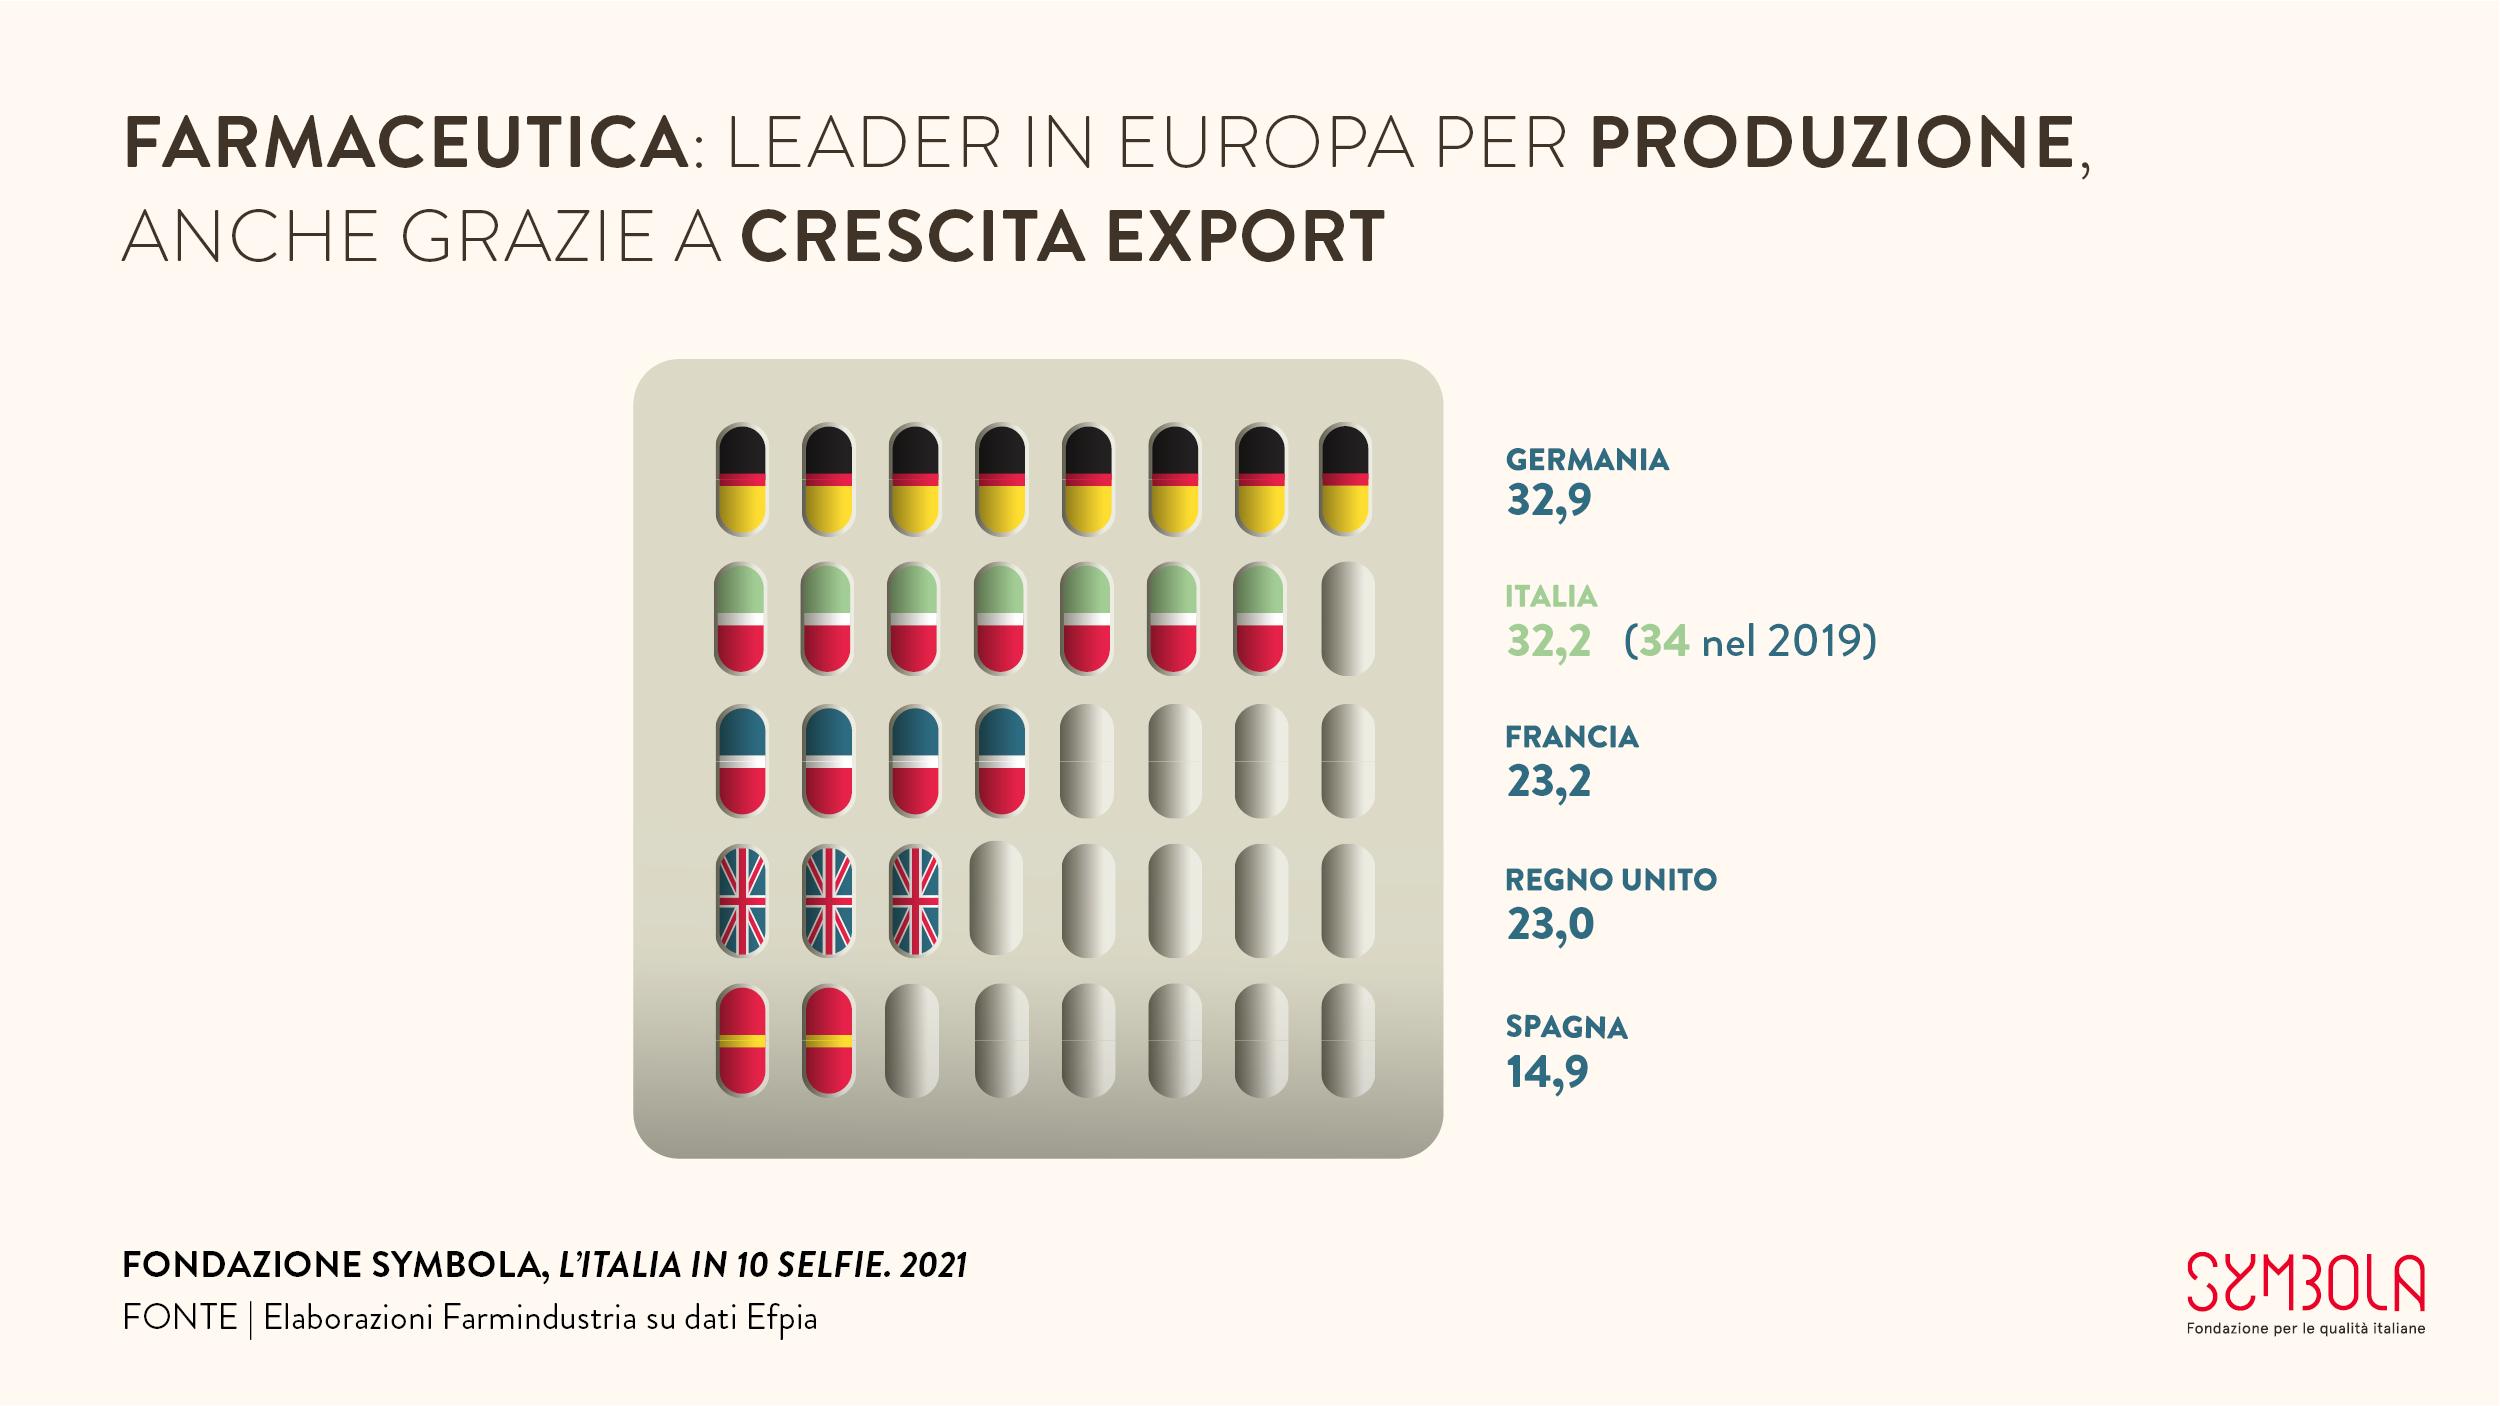 10 selfie 2021: Farmaceutica: leader in Europa per produzione, anche grazie a crescita export #9